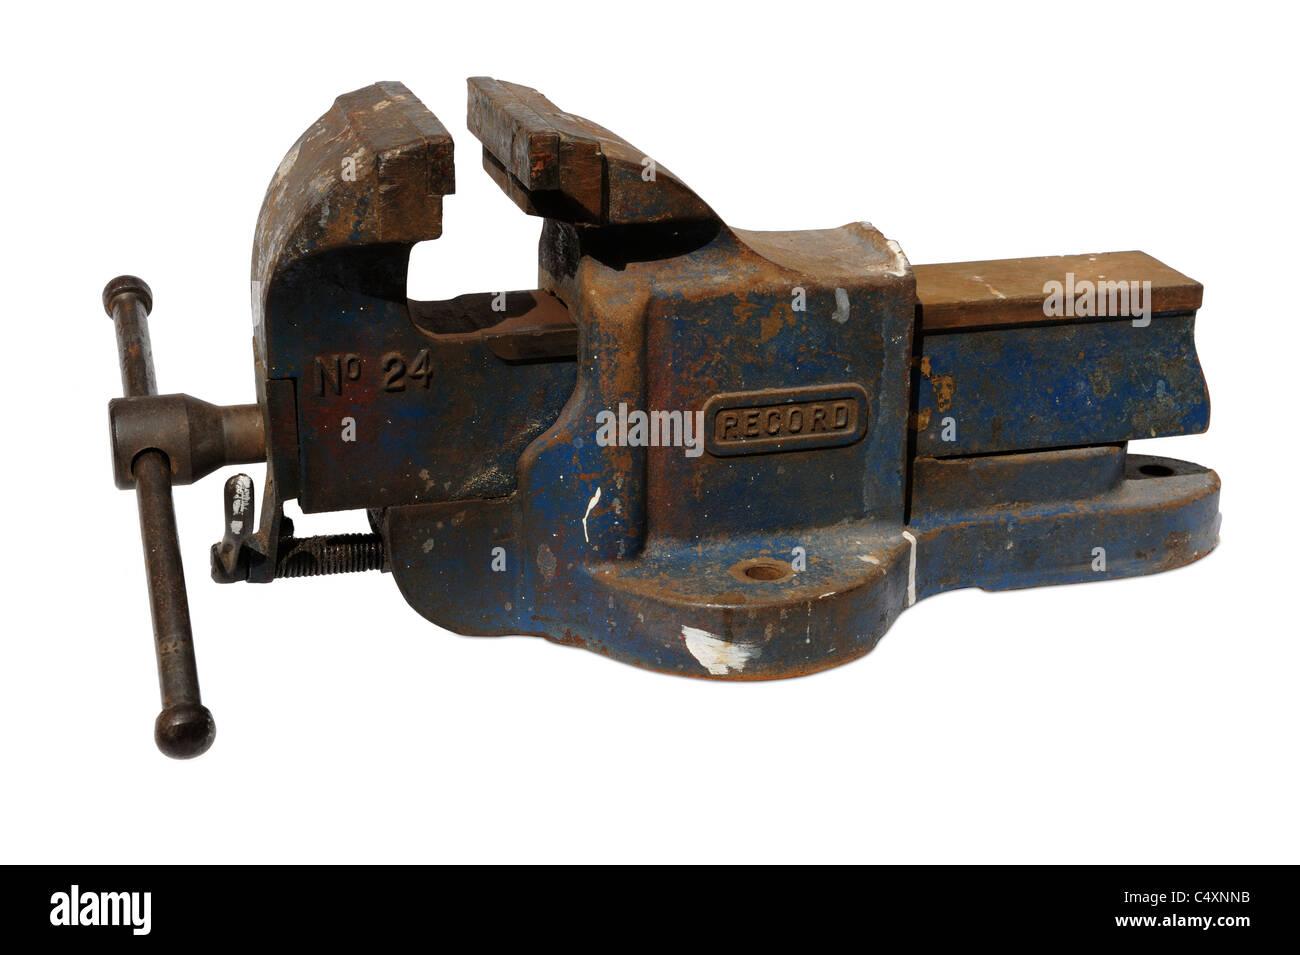 Heavy duty metal vice - Stock Image